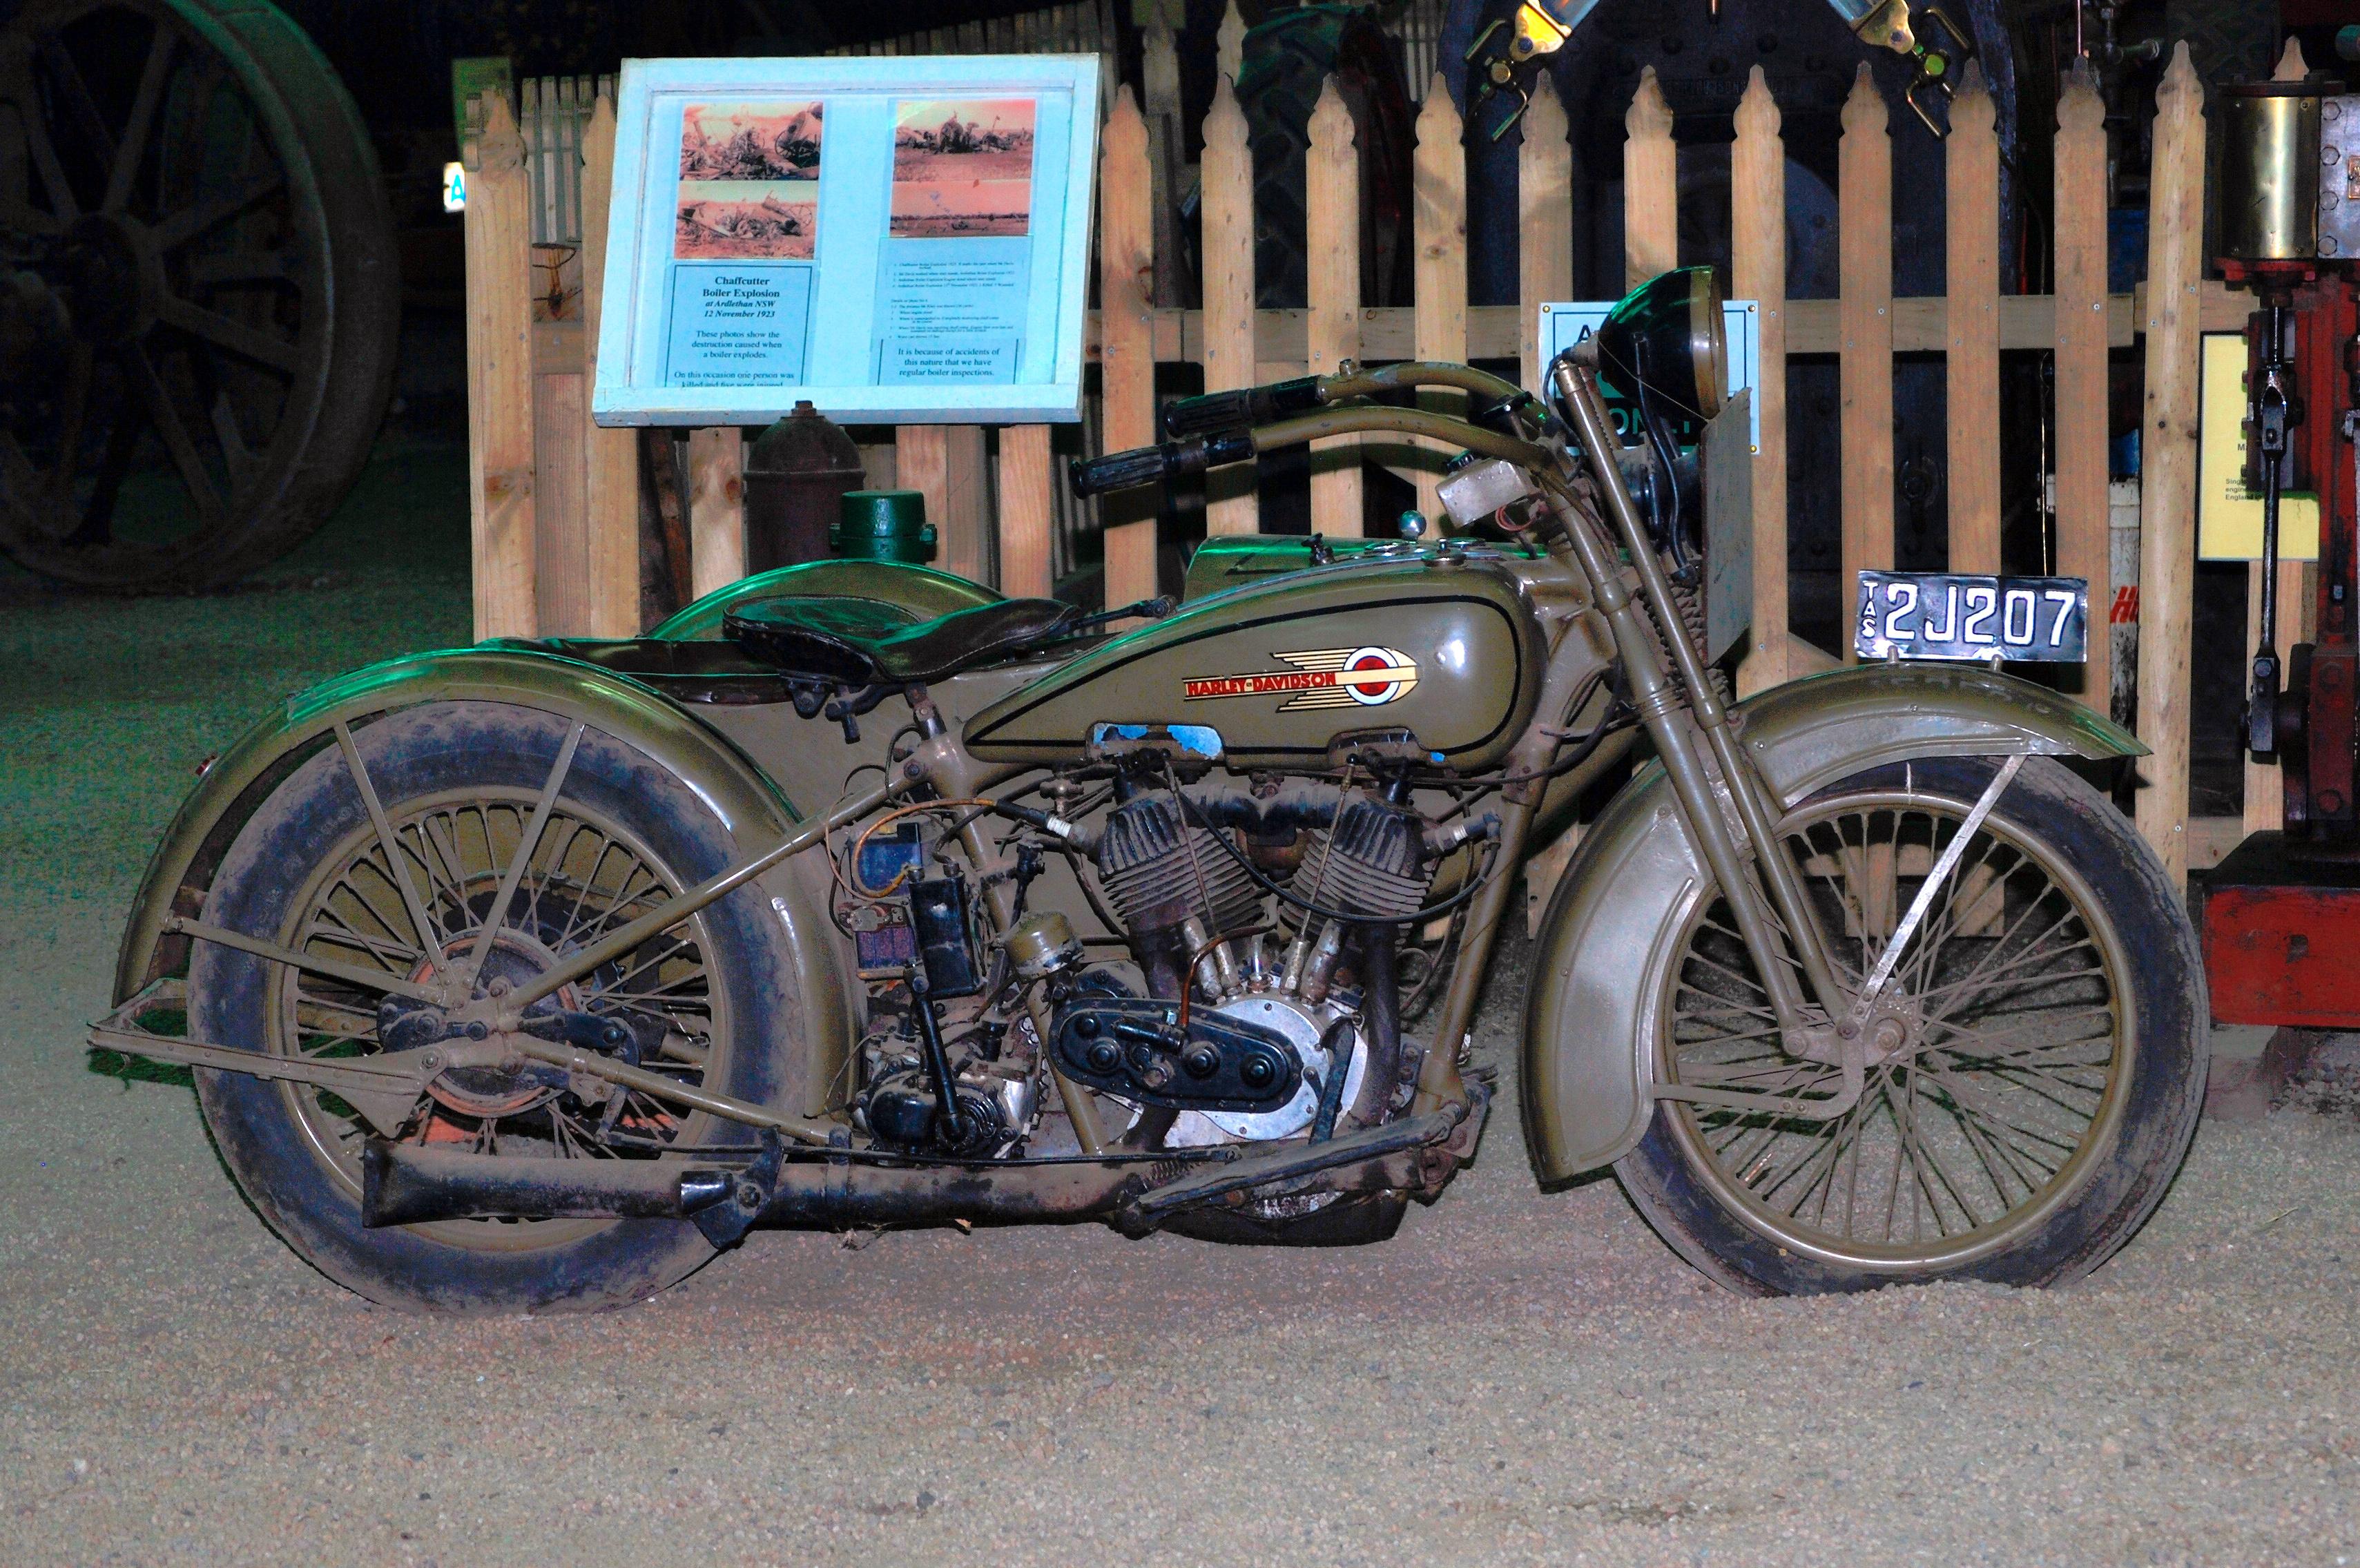 FilePearns Steamworld 1928 Harley Davidson Motorcycle